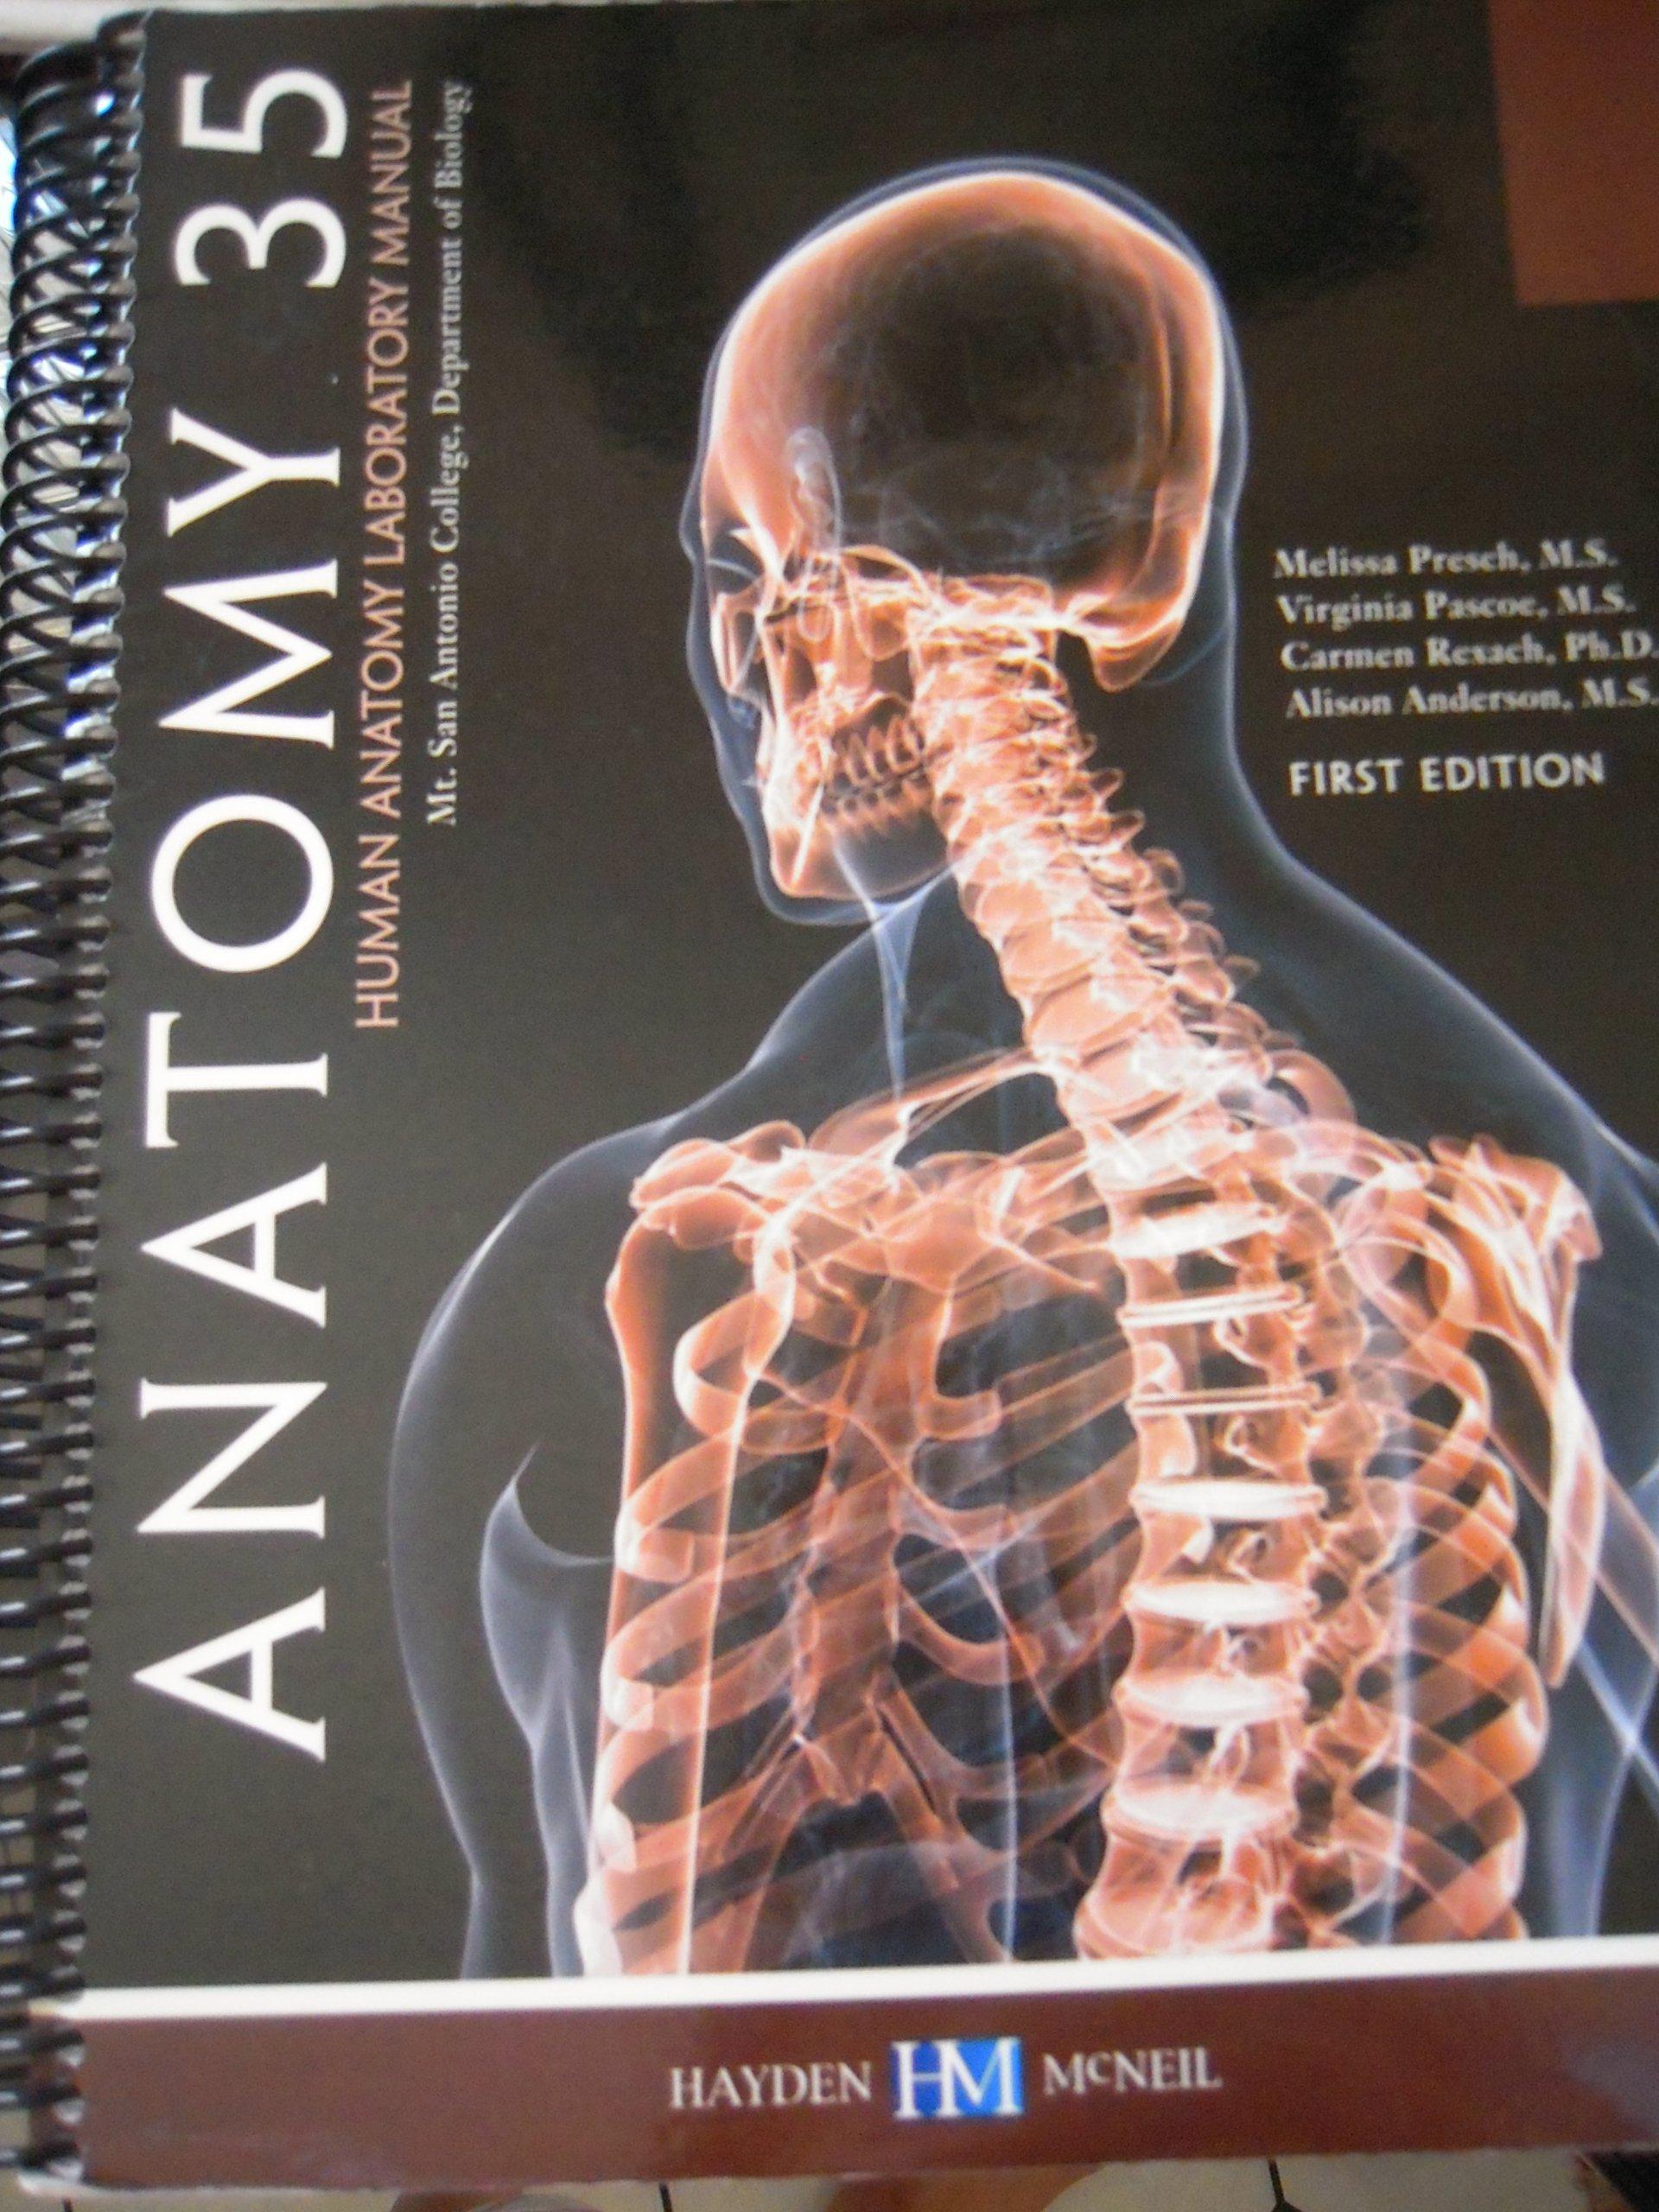 Anatomy 35 Human Anatomy Laboratory Manual First Edition for Mt. San ...